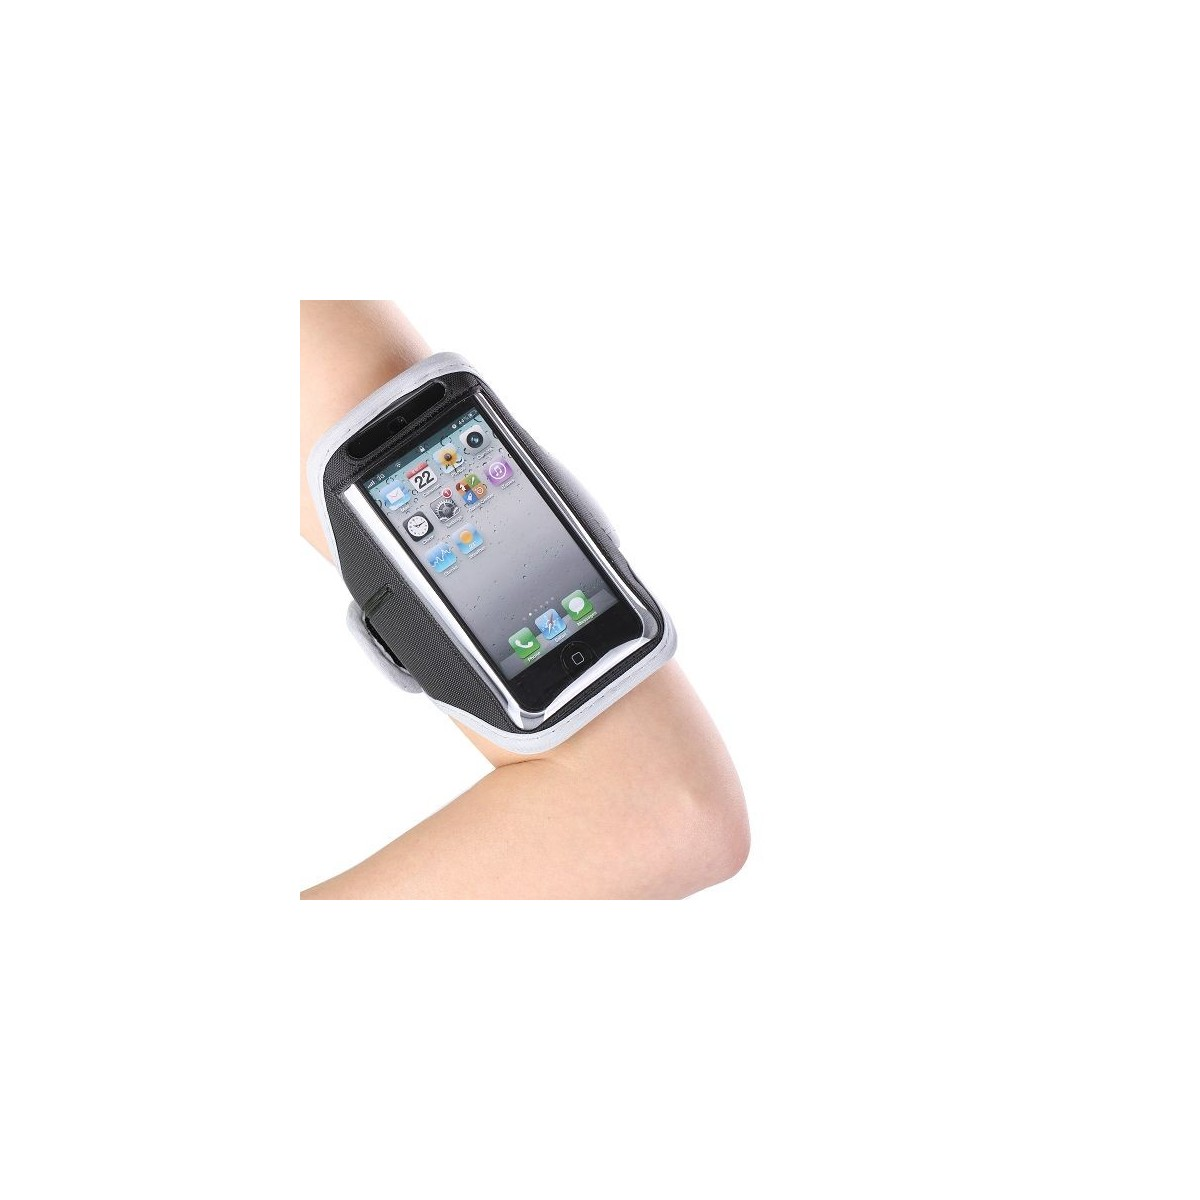 Brassard iPhone 5 / 5C / 5S contour gris